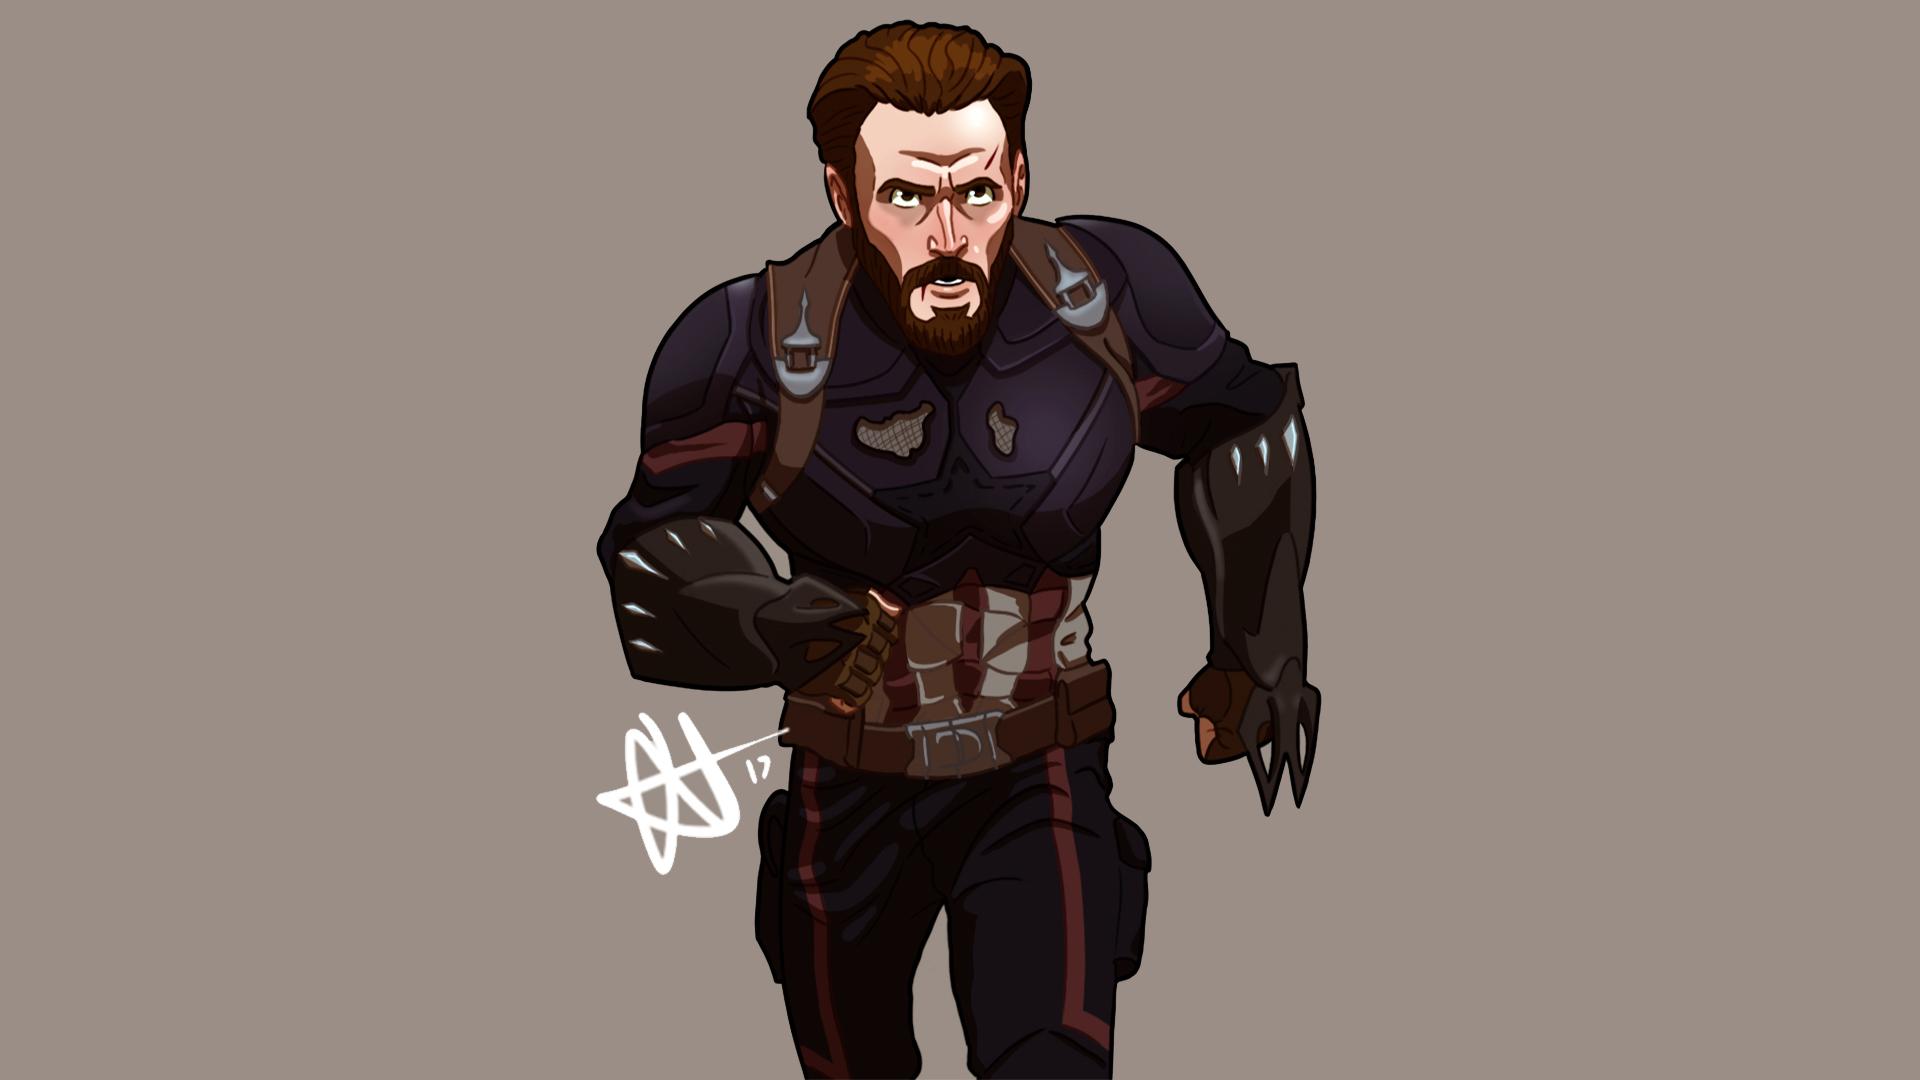 1280x2120 Captain America Avengers Infinity War Artwork